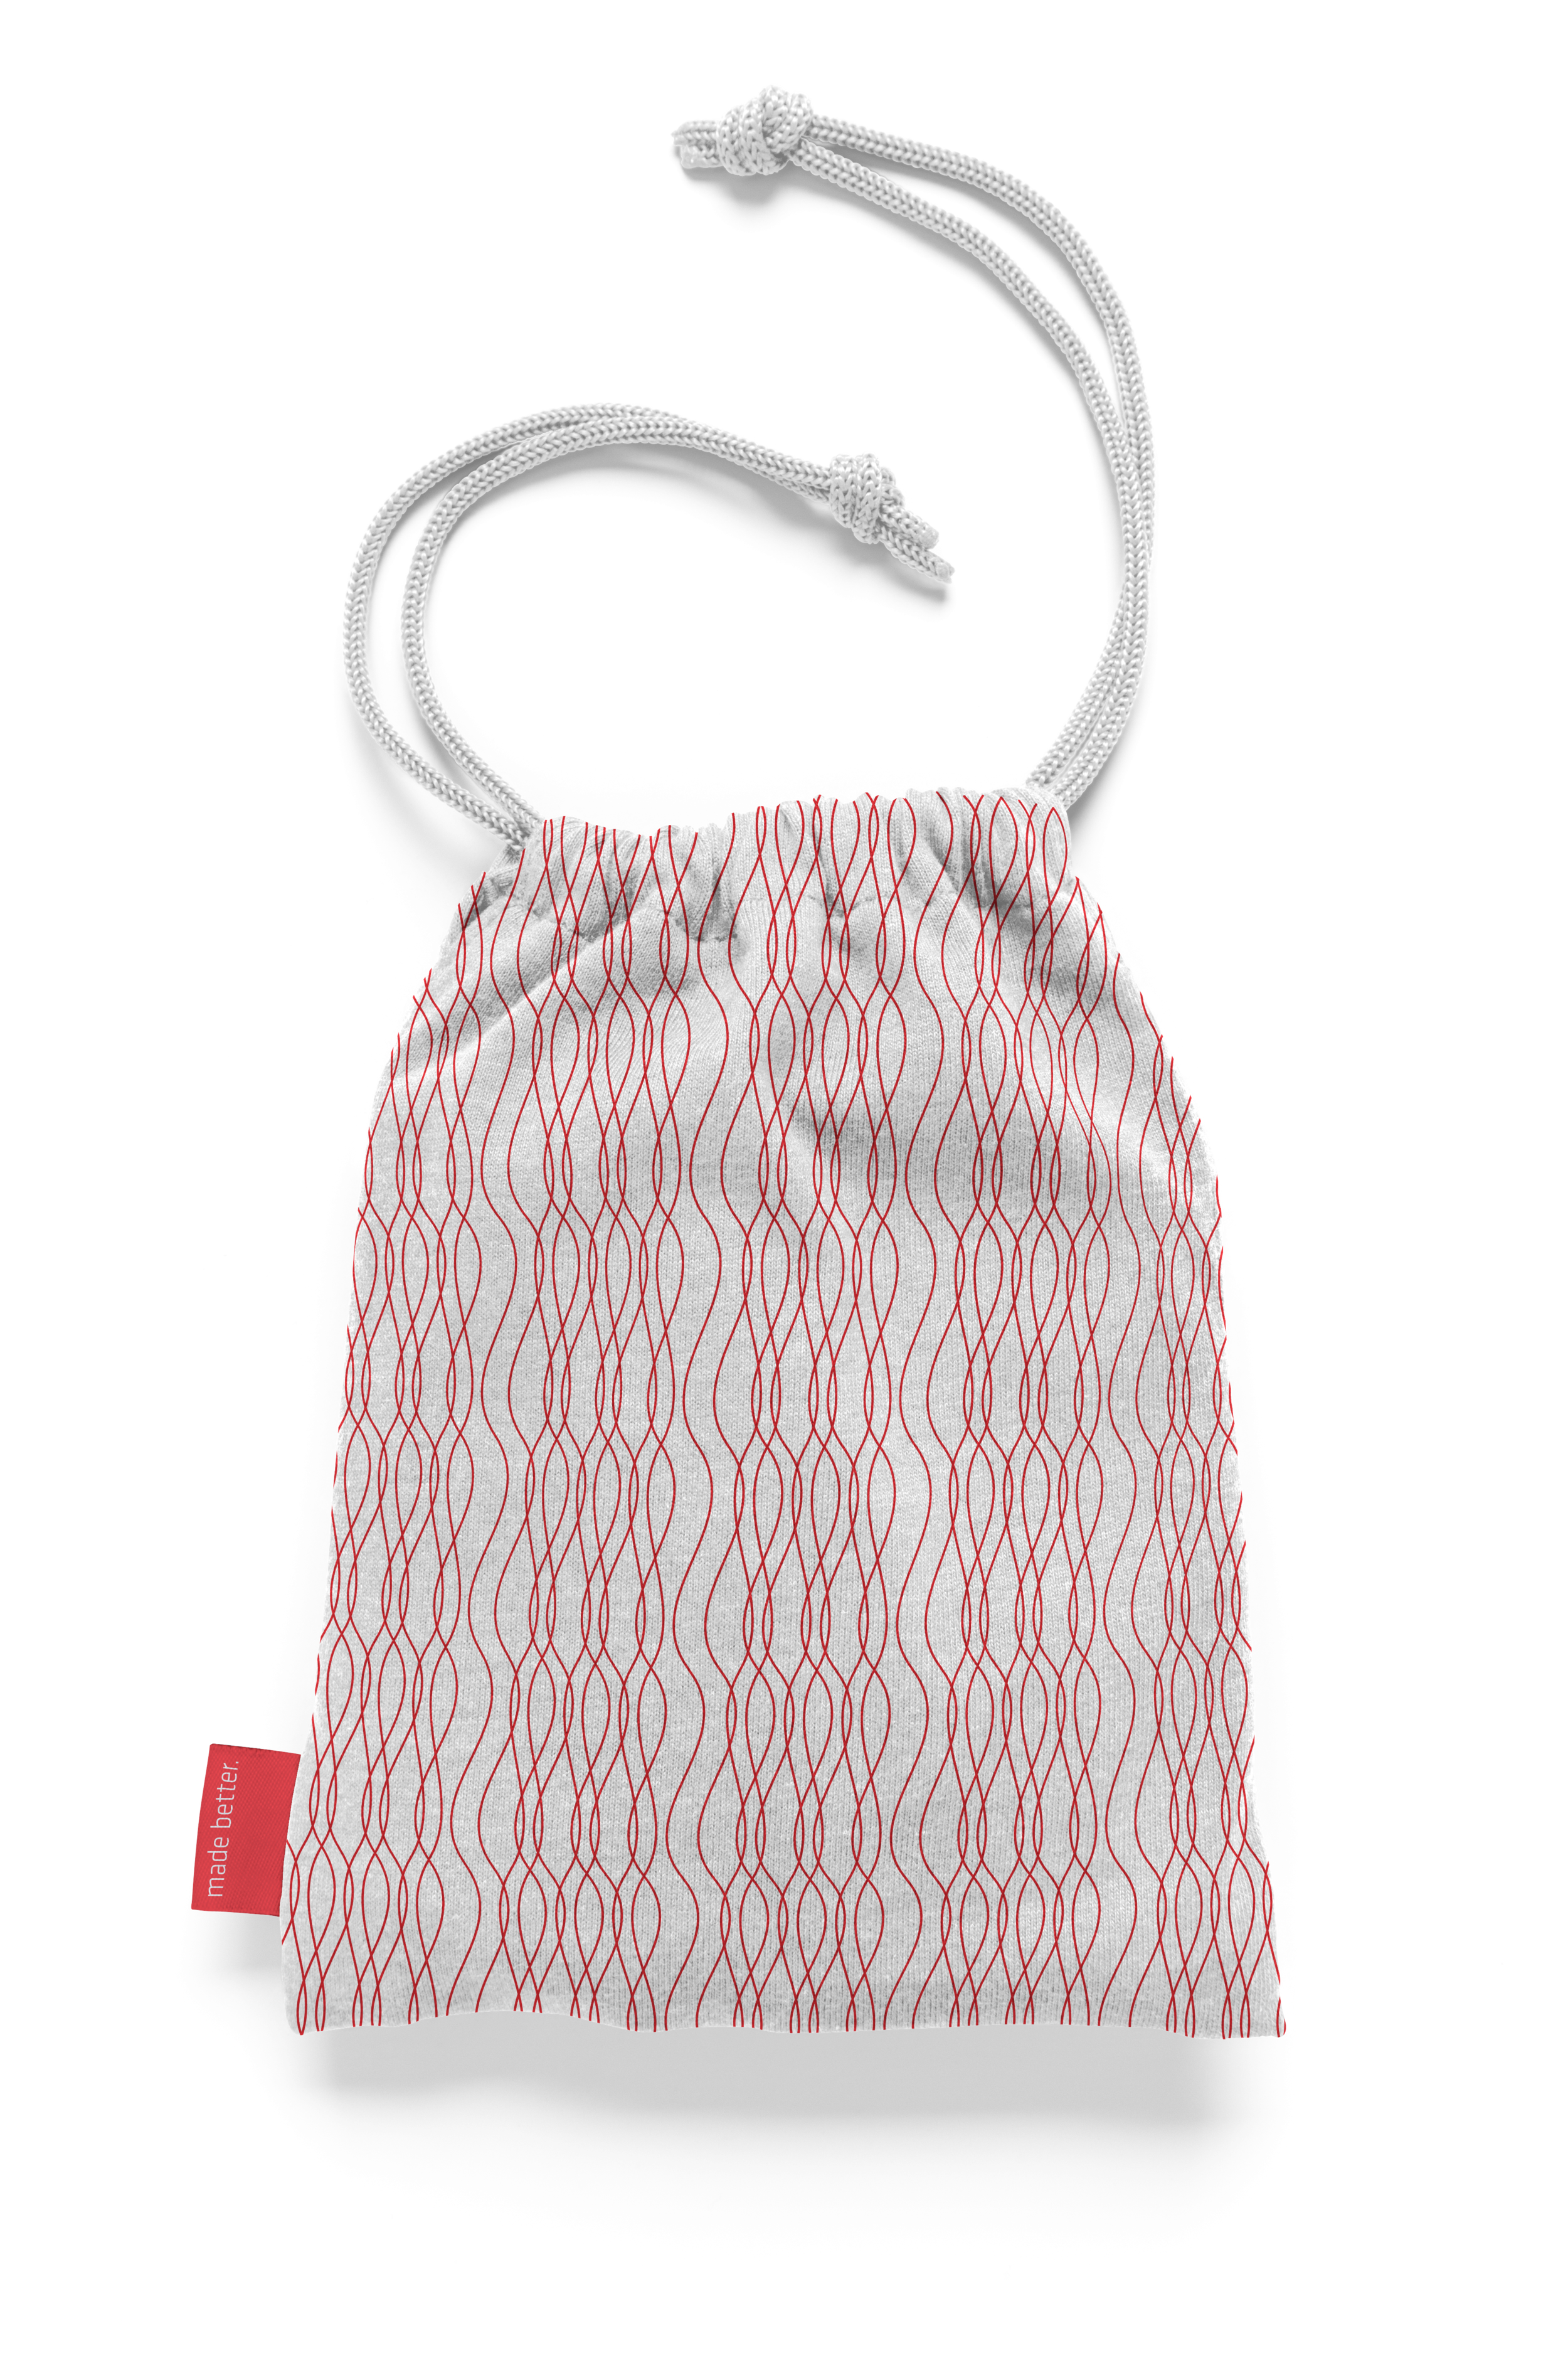 Bag 0631 2018-10-17_1.png